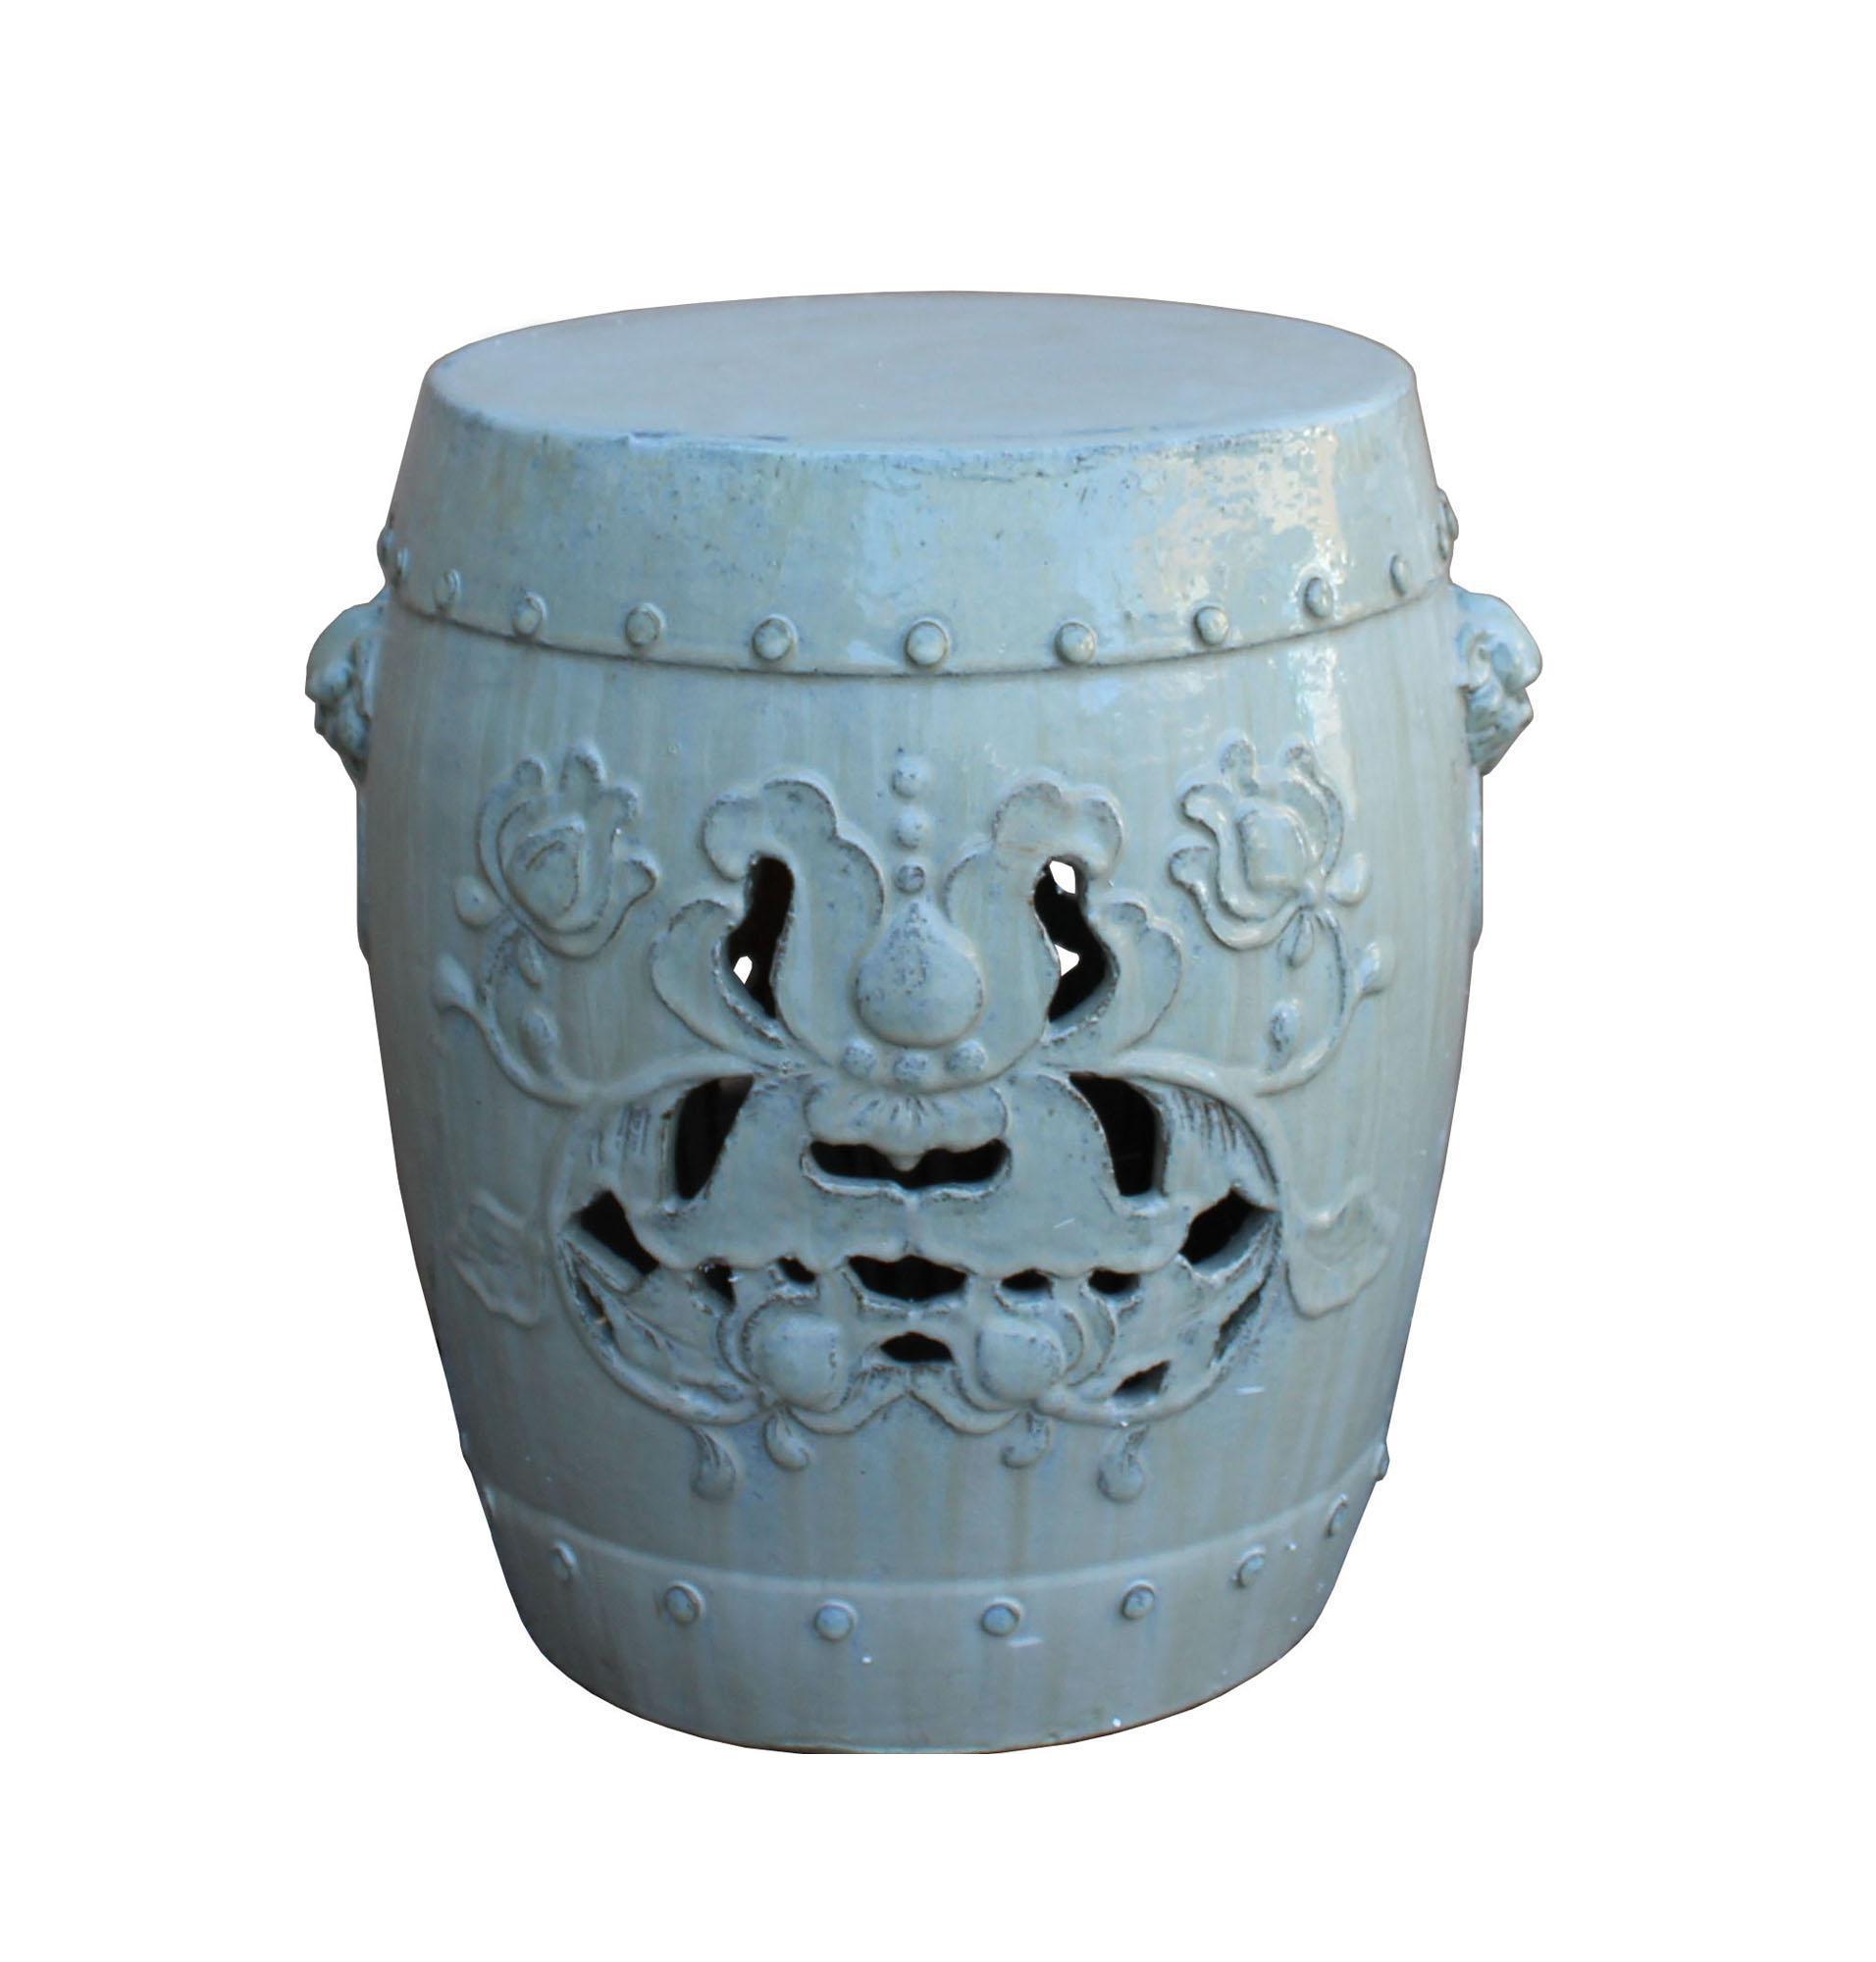 Chinese Off White Round Lotus Clay Ceramic Garden Stool Table  sc 1 st  Chairish & Vintage u0026 Used Garden Stools   Chairish islam-shia.org